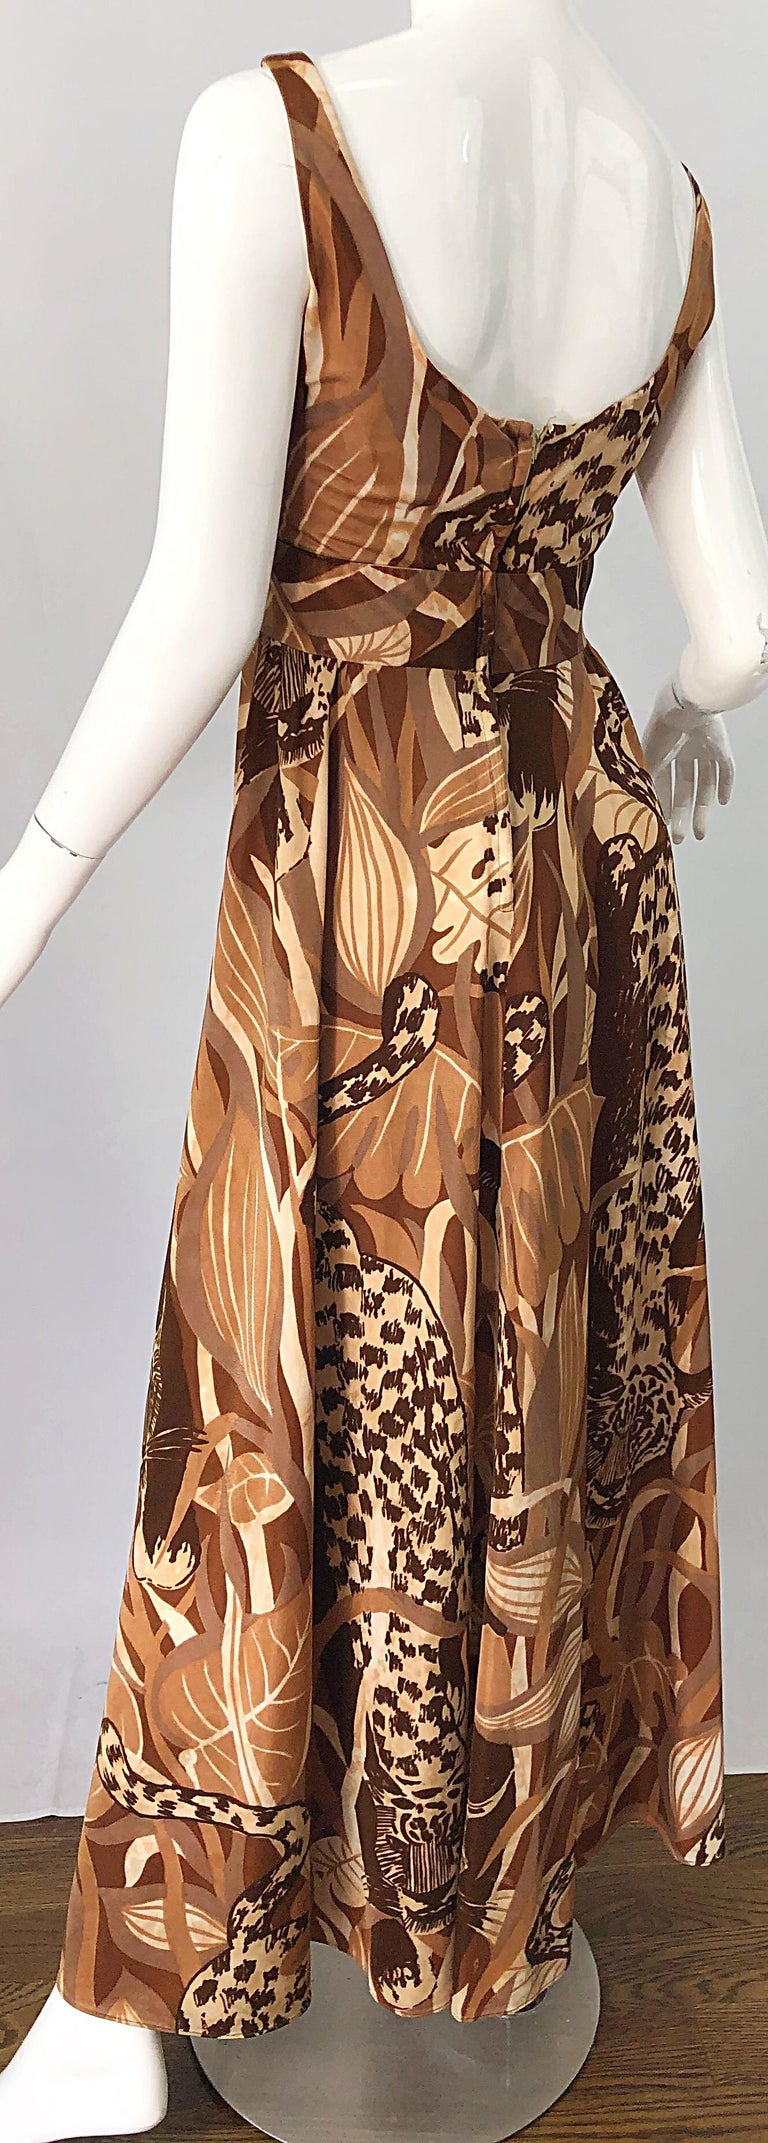 Amazing 1970s Futura Couture Leopard Print Joe Exotic Vintage 70s Maxi Dress For Sale 1